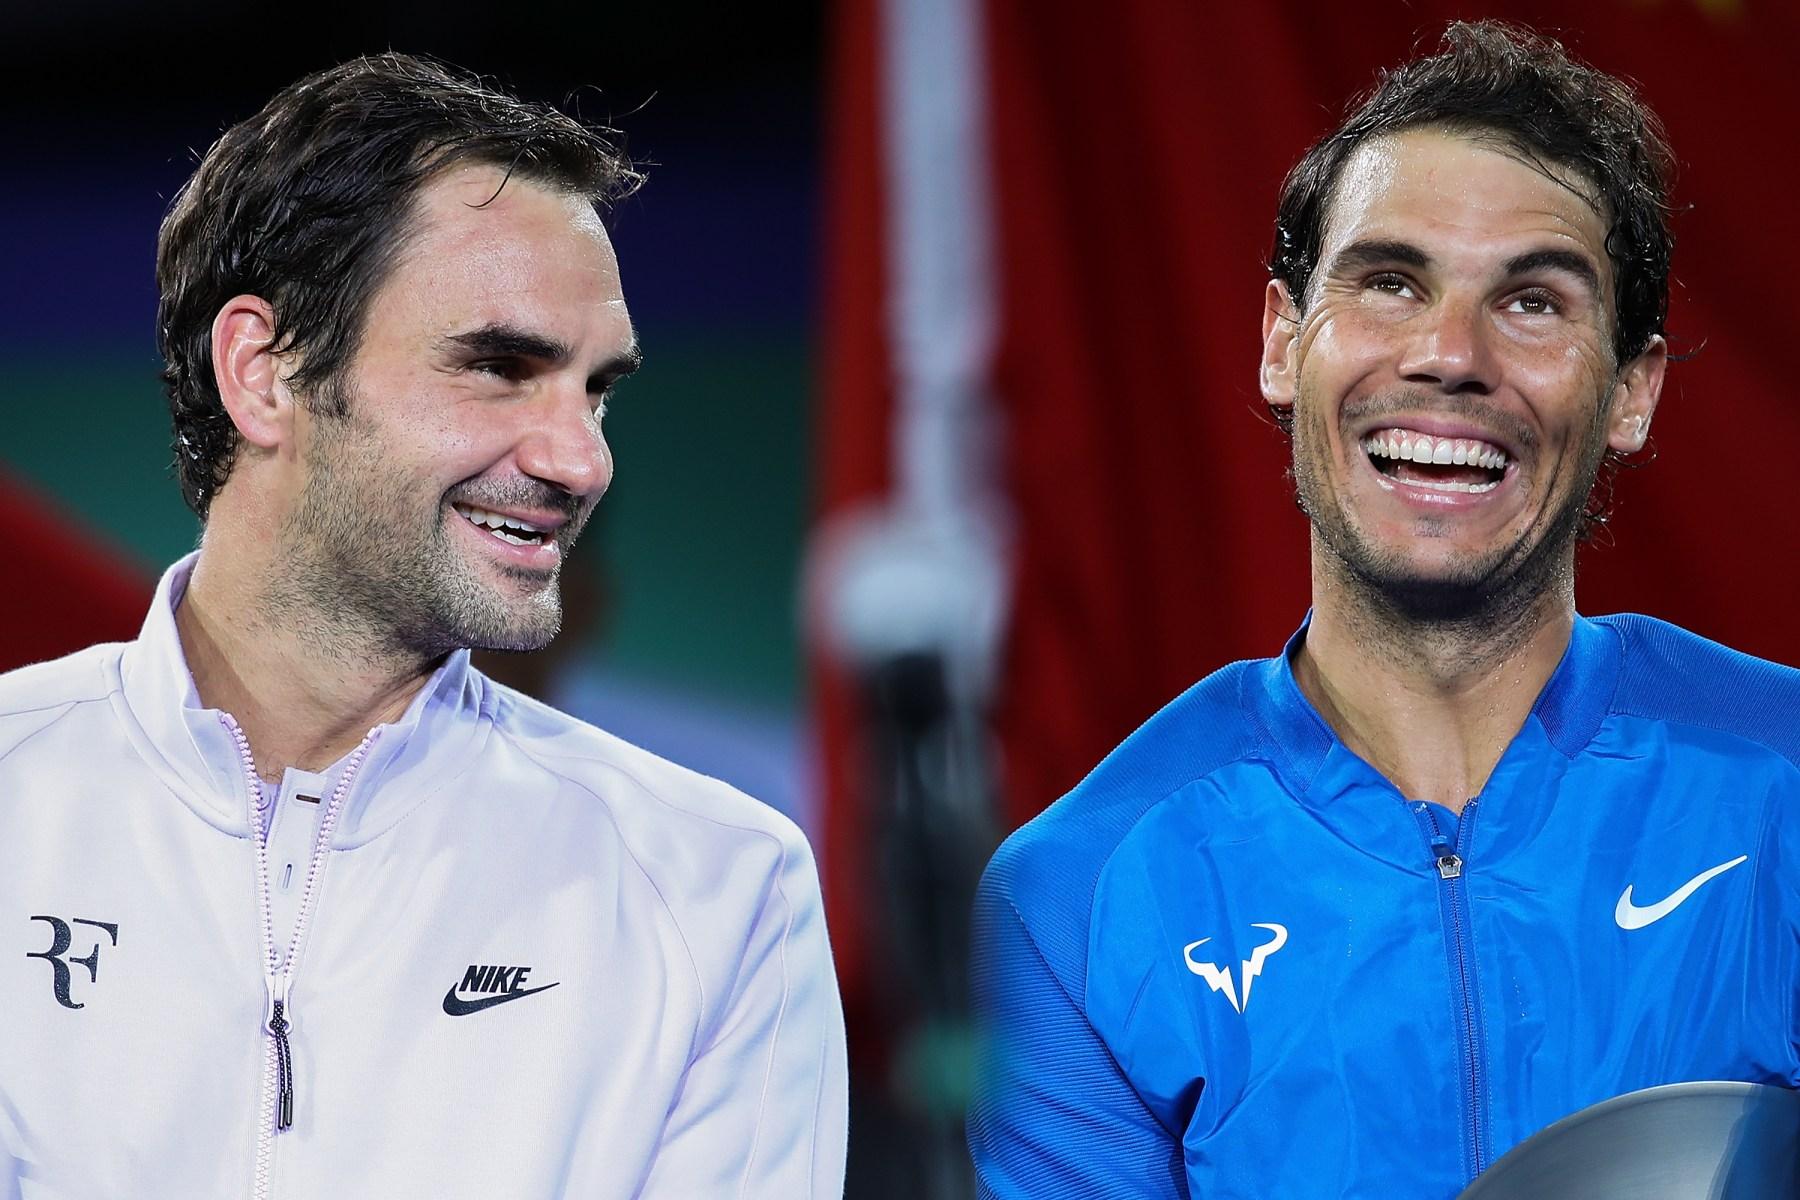 federer nadal future of tennis after coronavirus